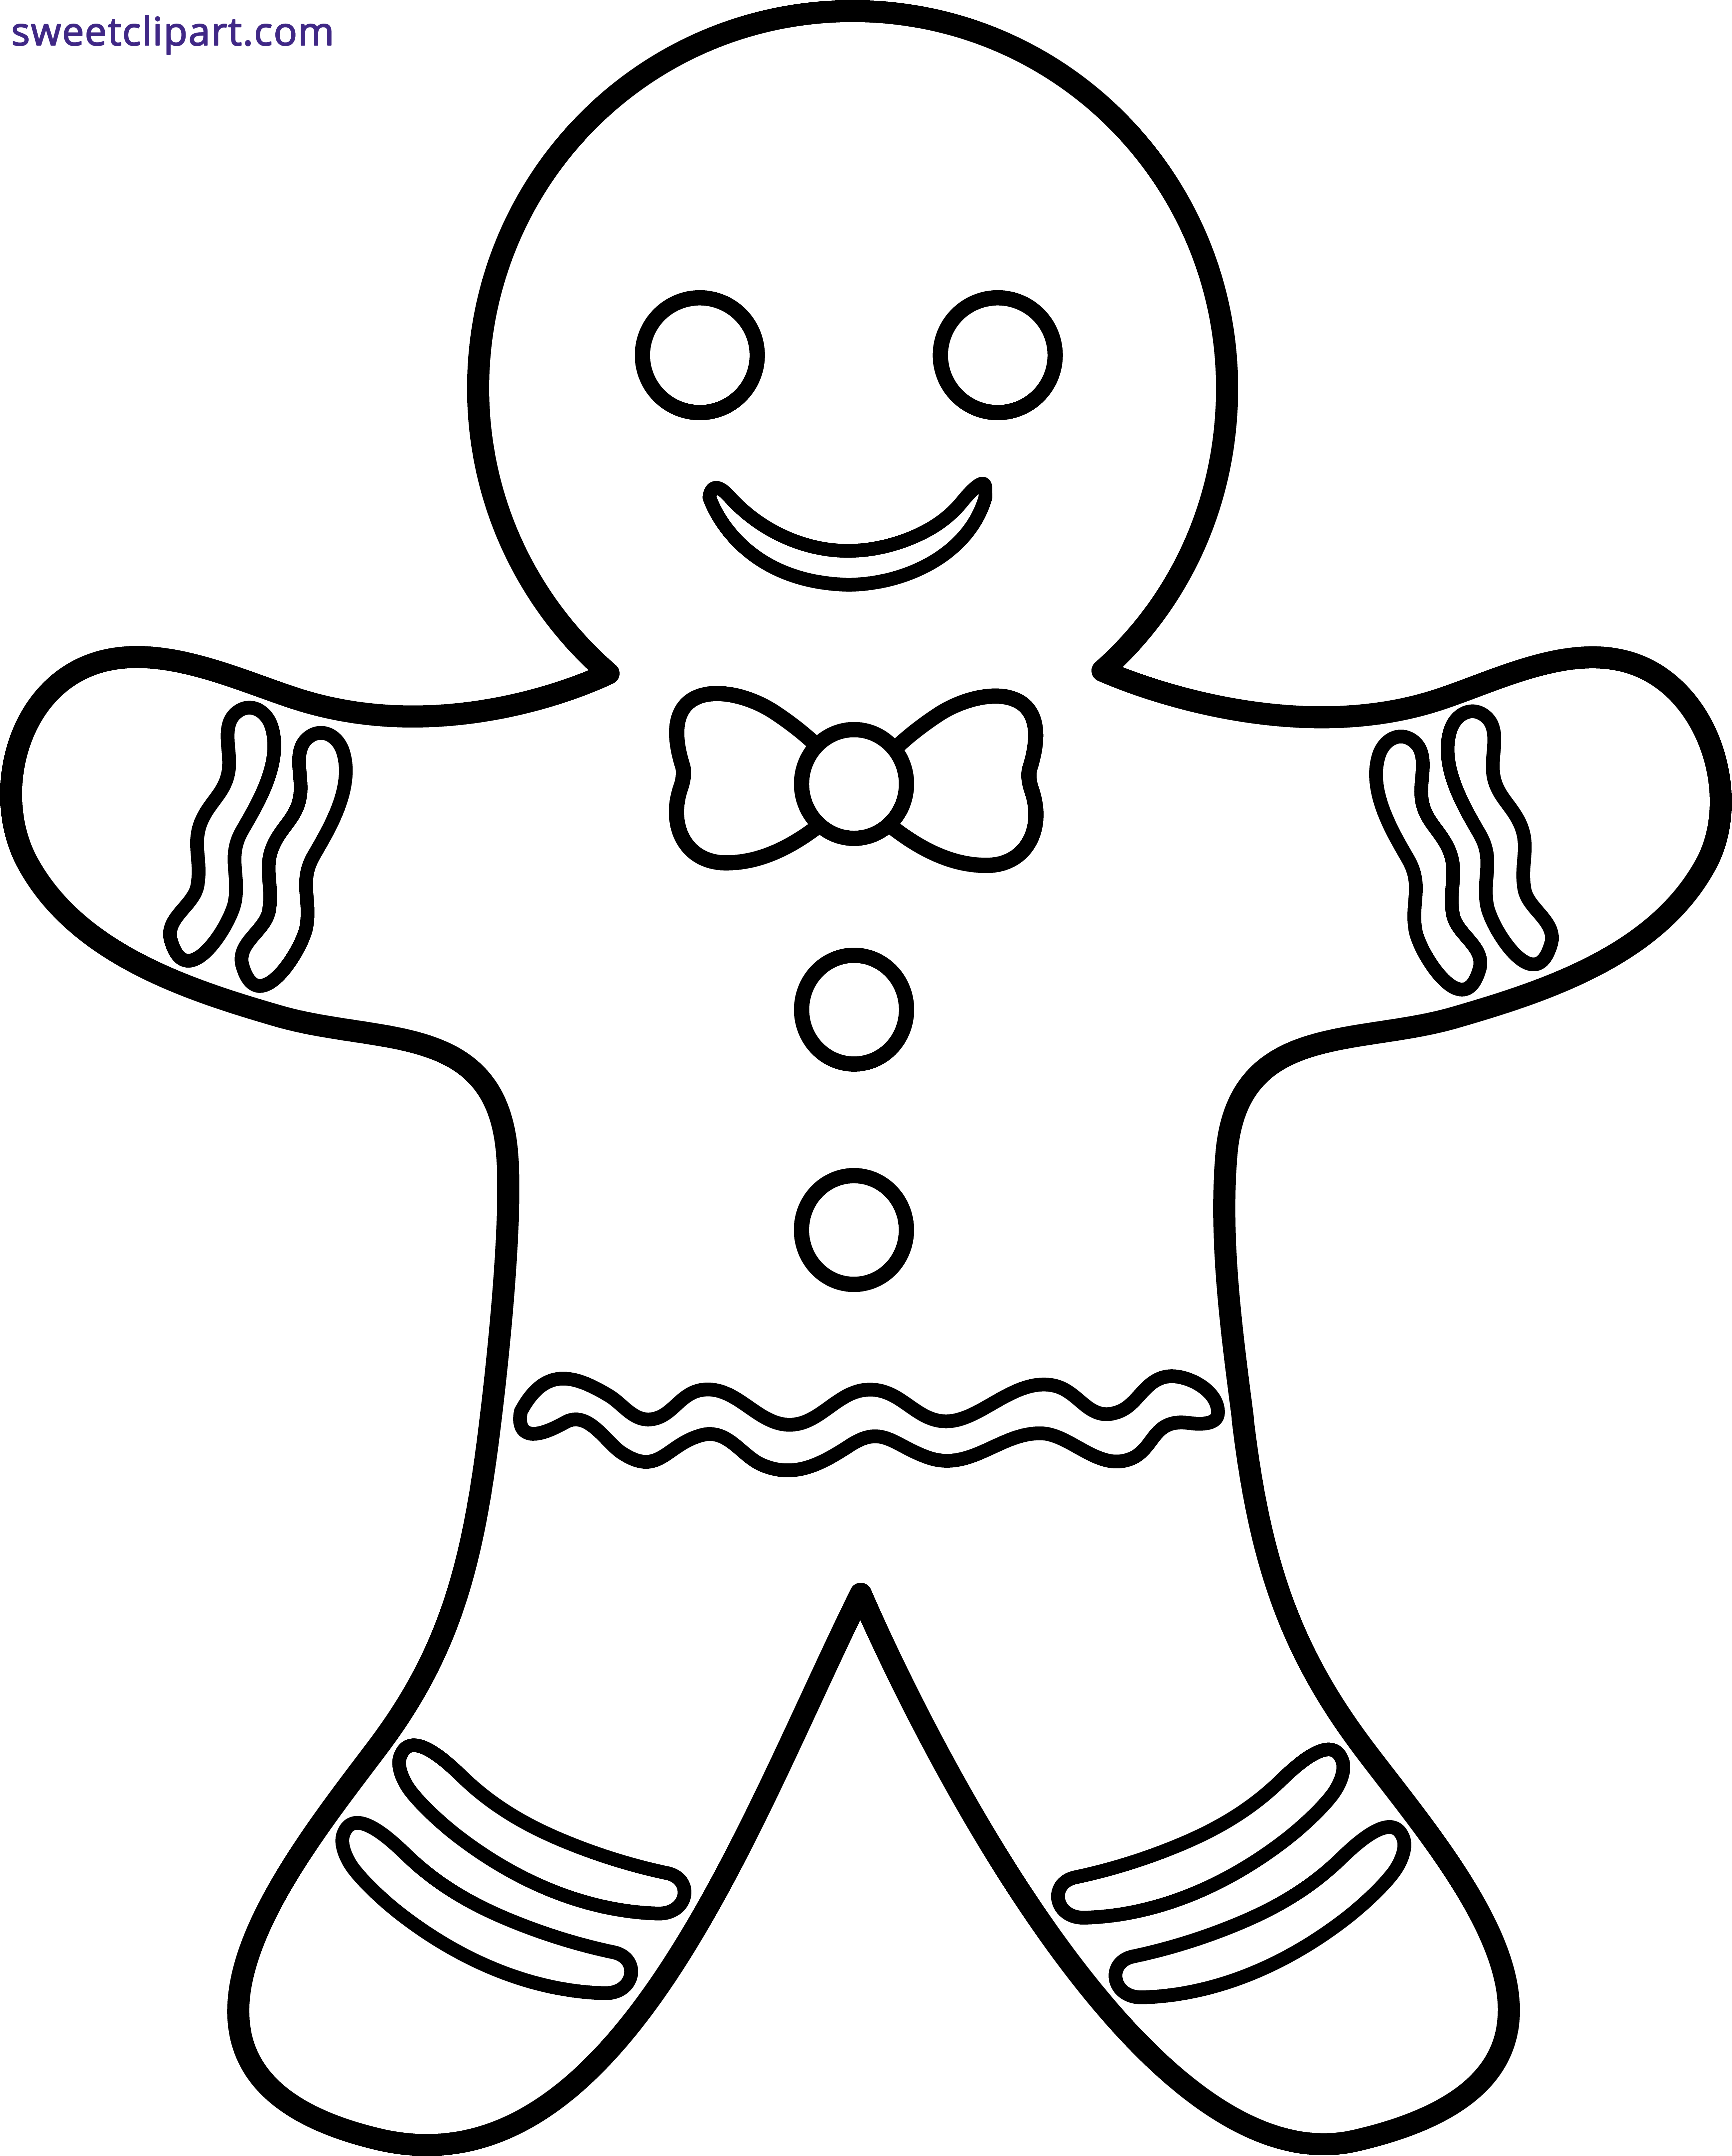 Gingerbread man outline clipart sweet clip art gingerbread man outline clipart voltagebd Image collections